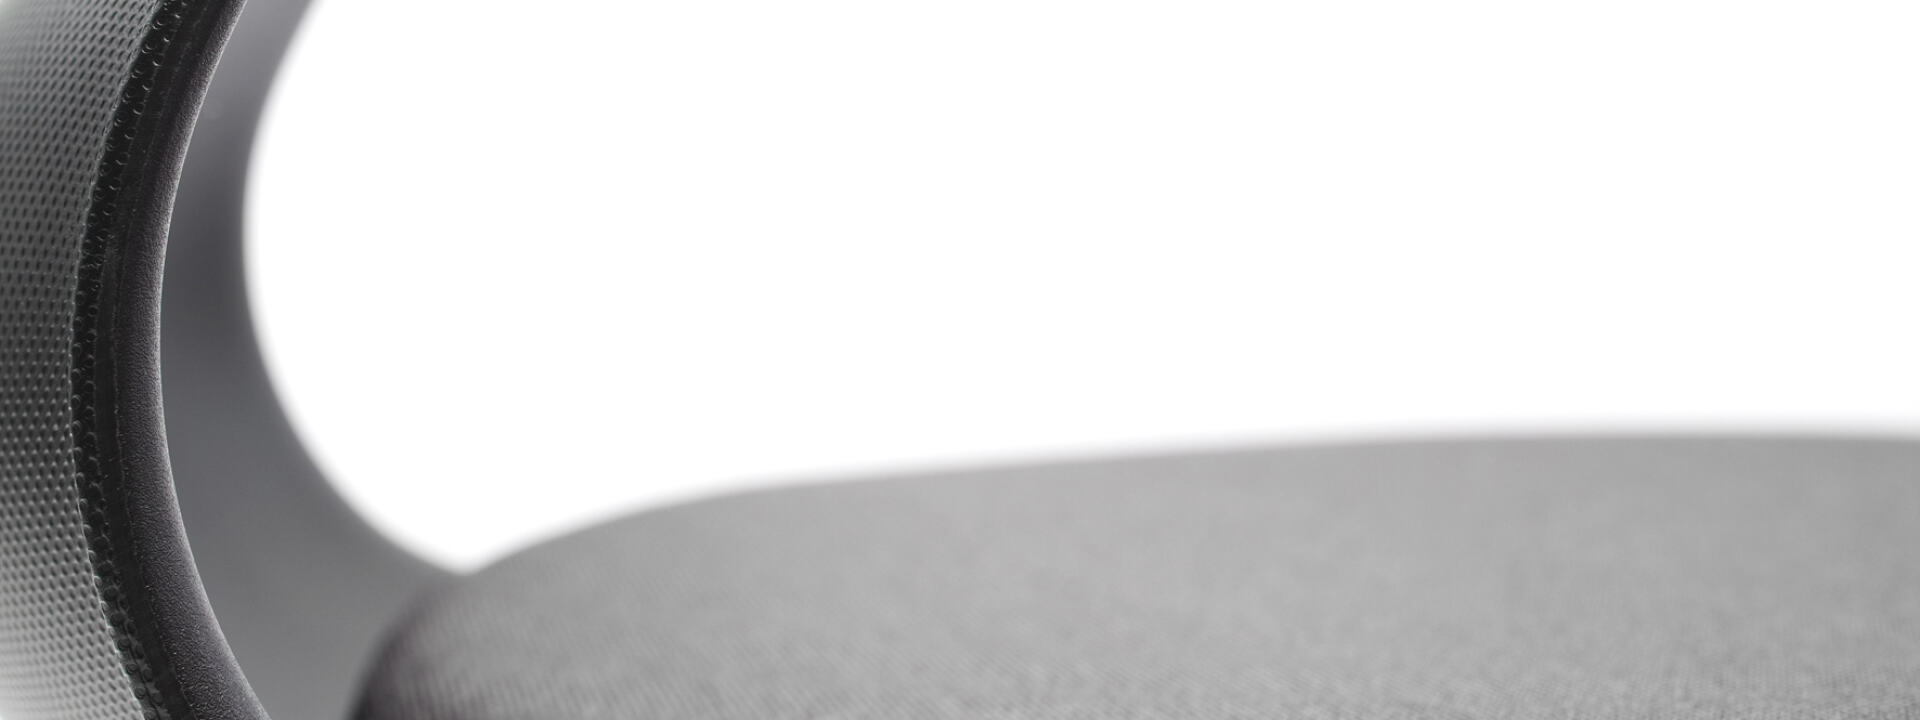 PRO 6 Drehstuhl Aluminium poliert, Sitzsysteme, Bürostuhl, Bürostühle, Drehstuhl, Drehstühle